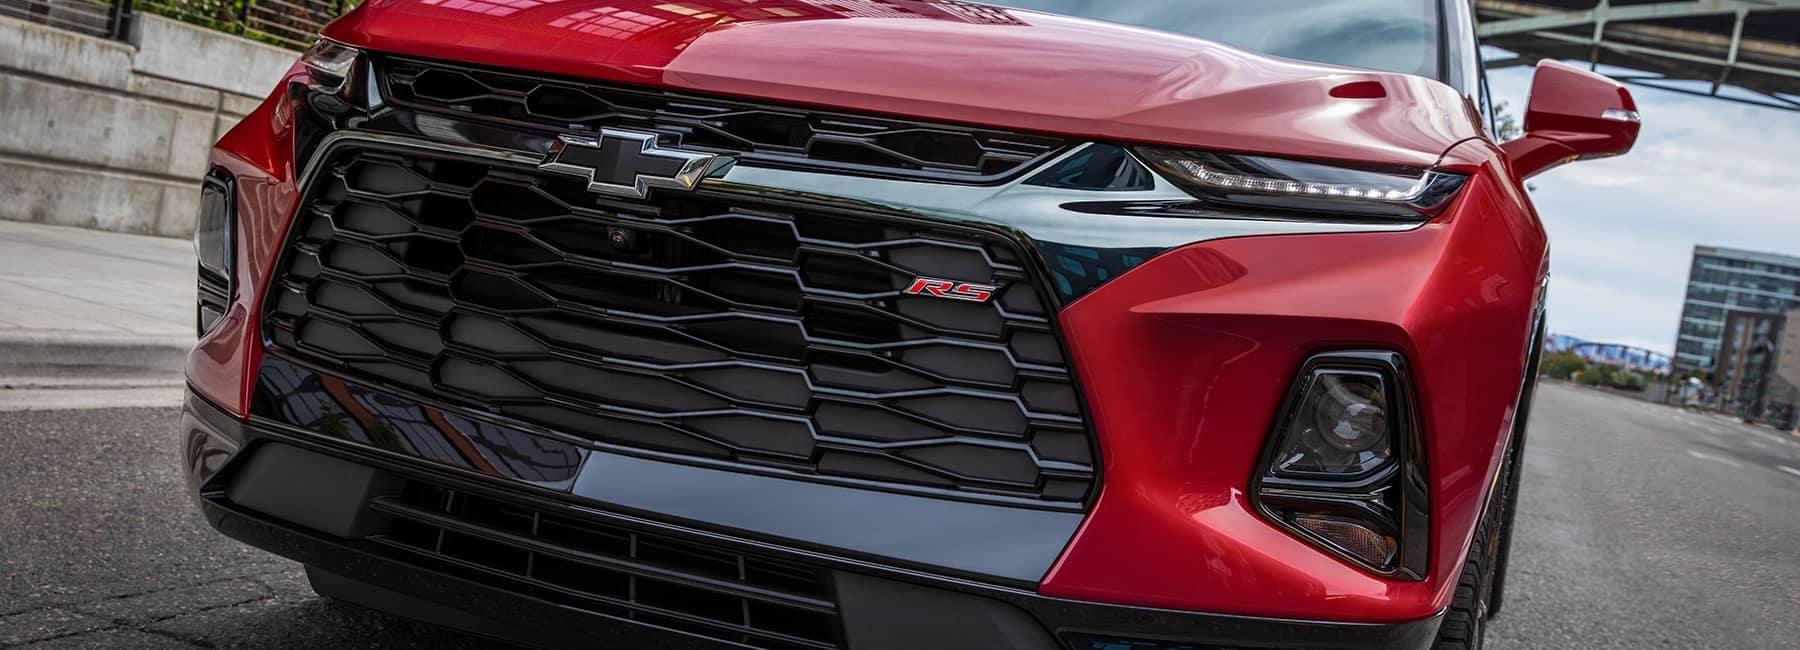 Red 2020 Blazer Front Grille